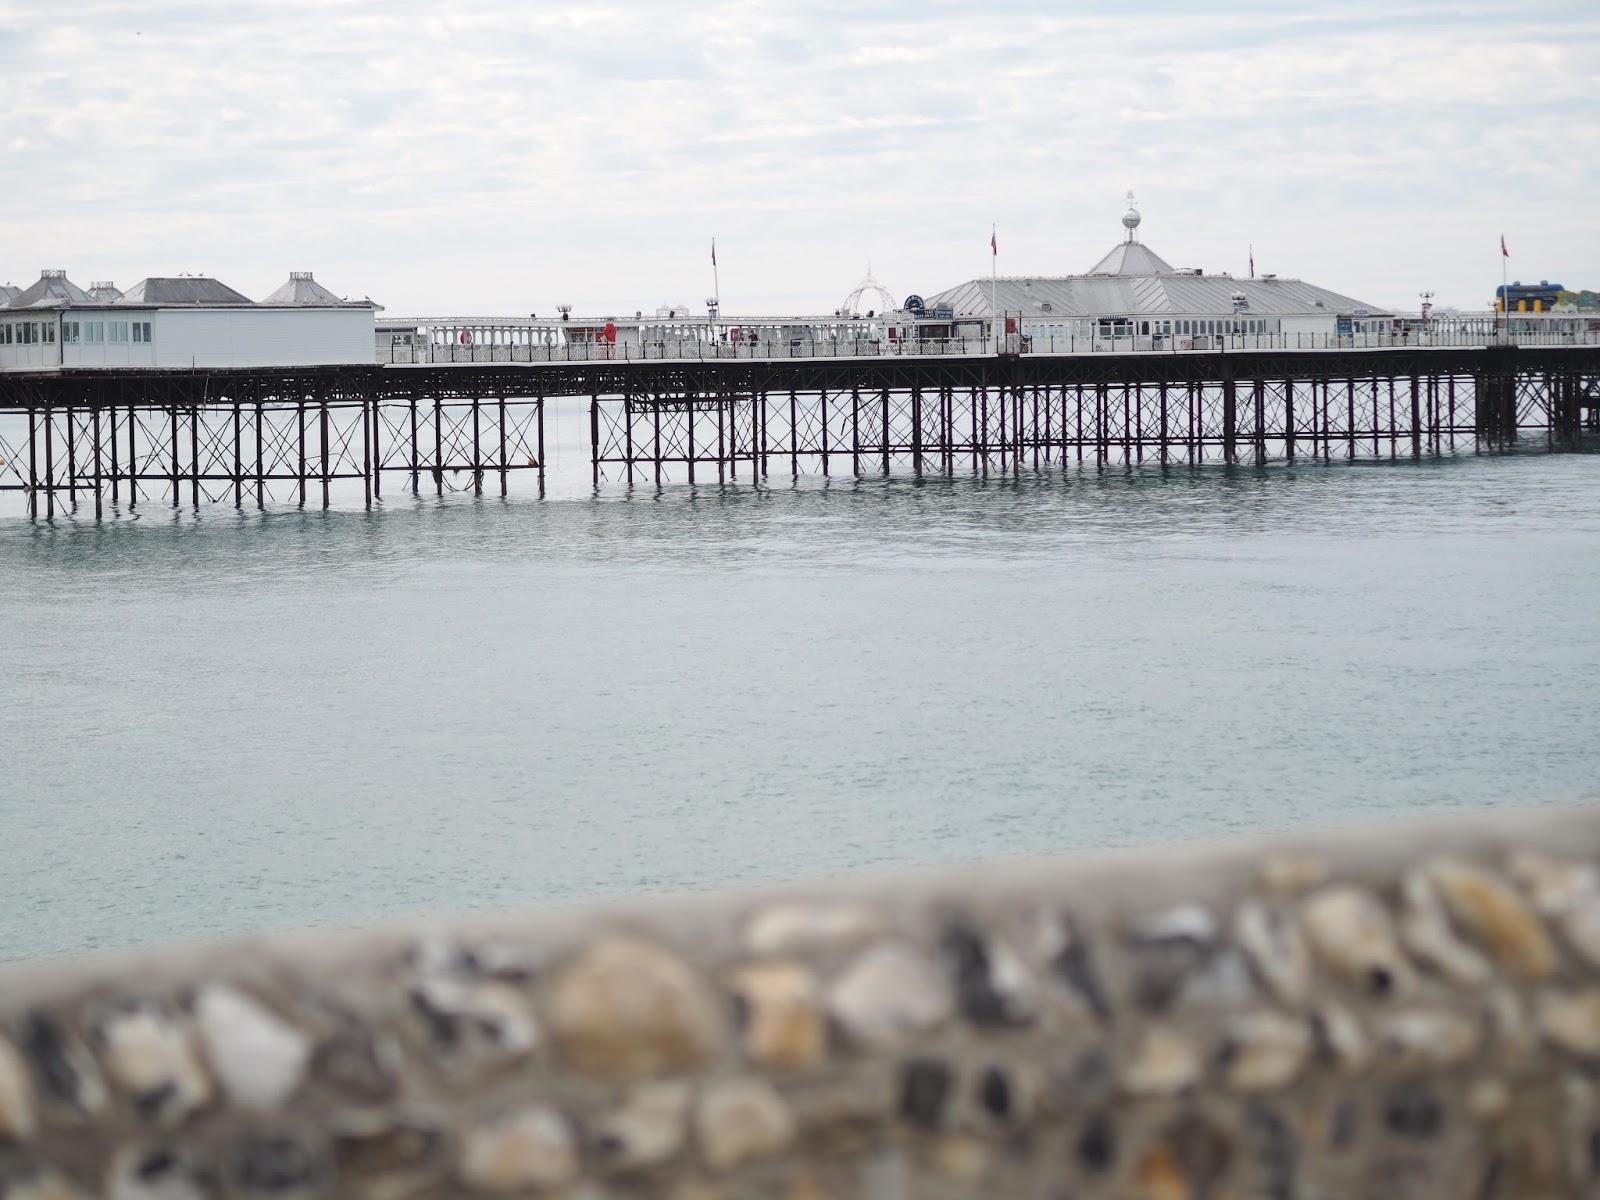 View of Brighton pier